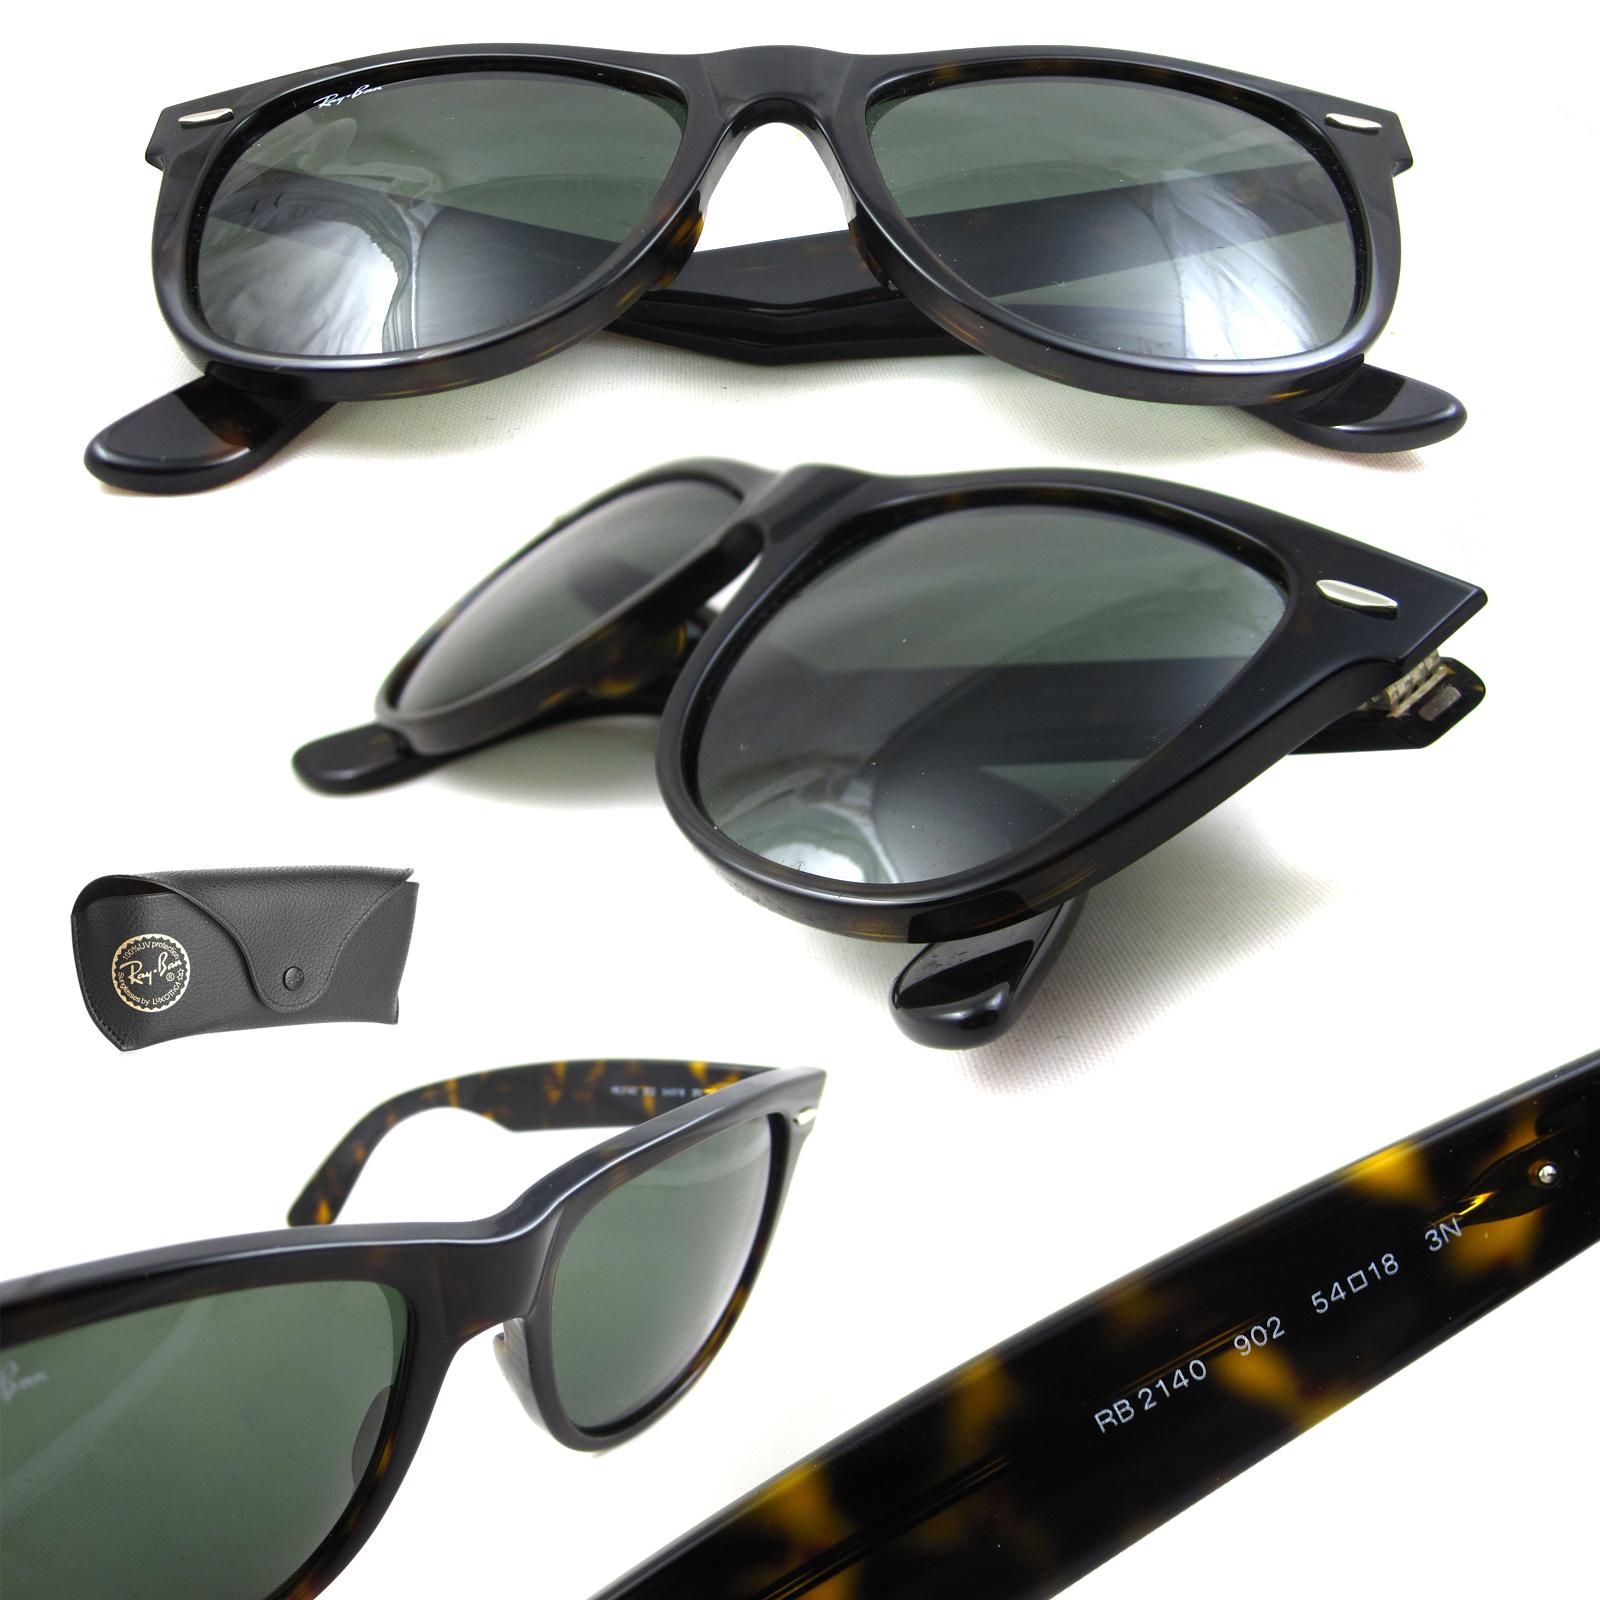 b95620151a5a9 Sentinel Ray-Ban Sunglasses Wayfarer 2140 902 Tortoise Green G-15 Large 54mm